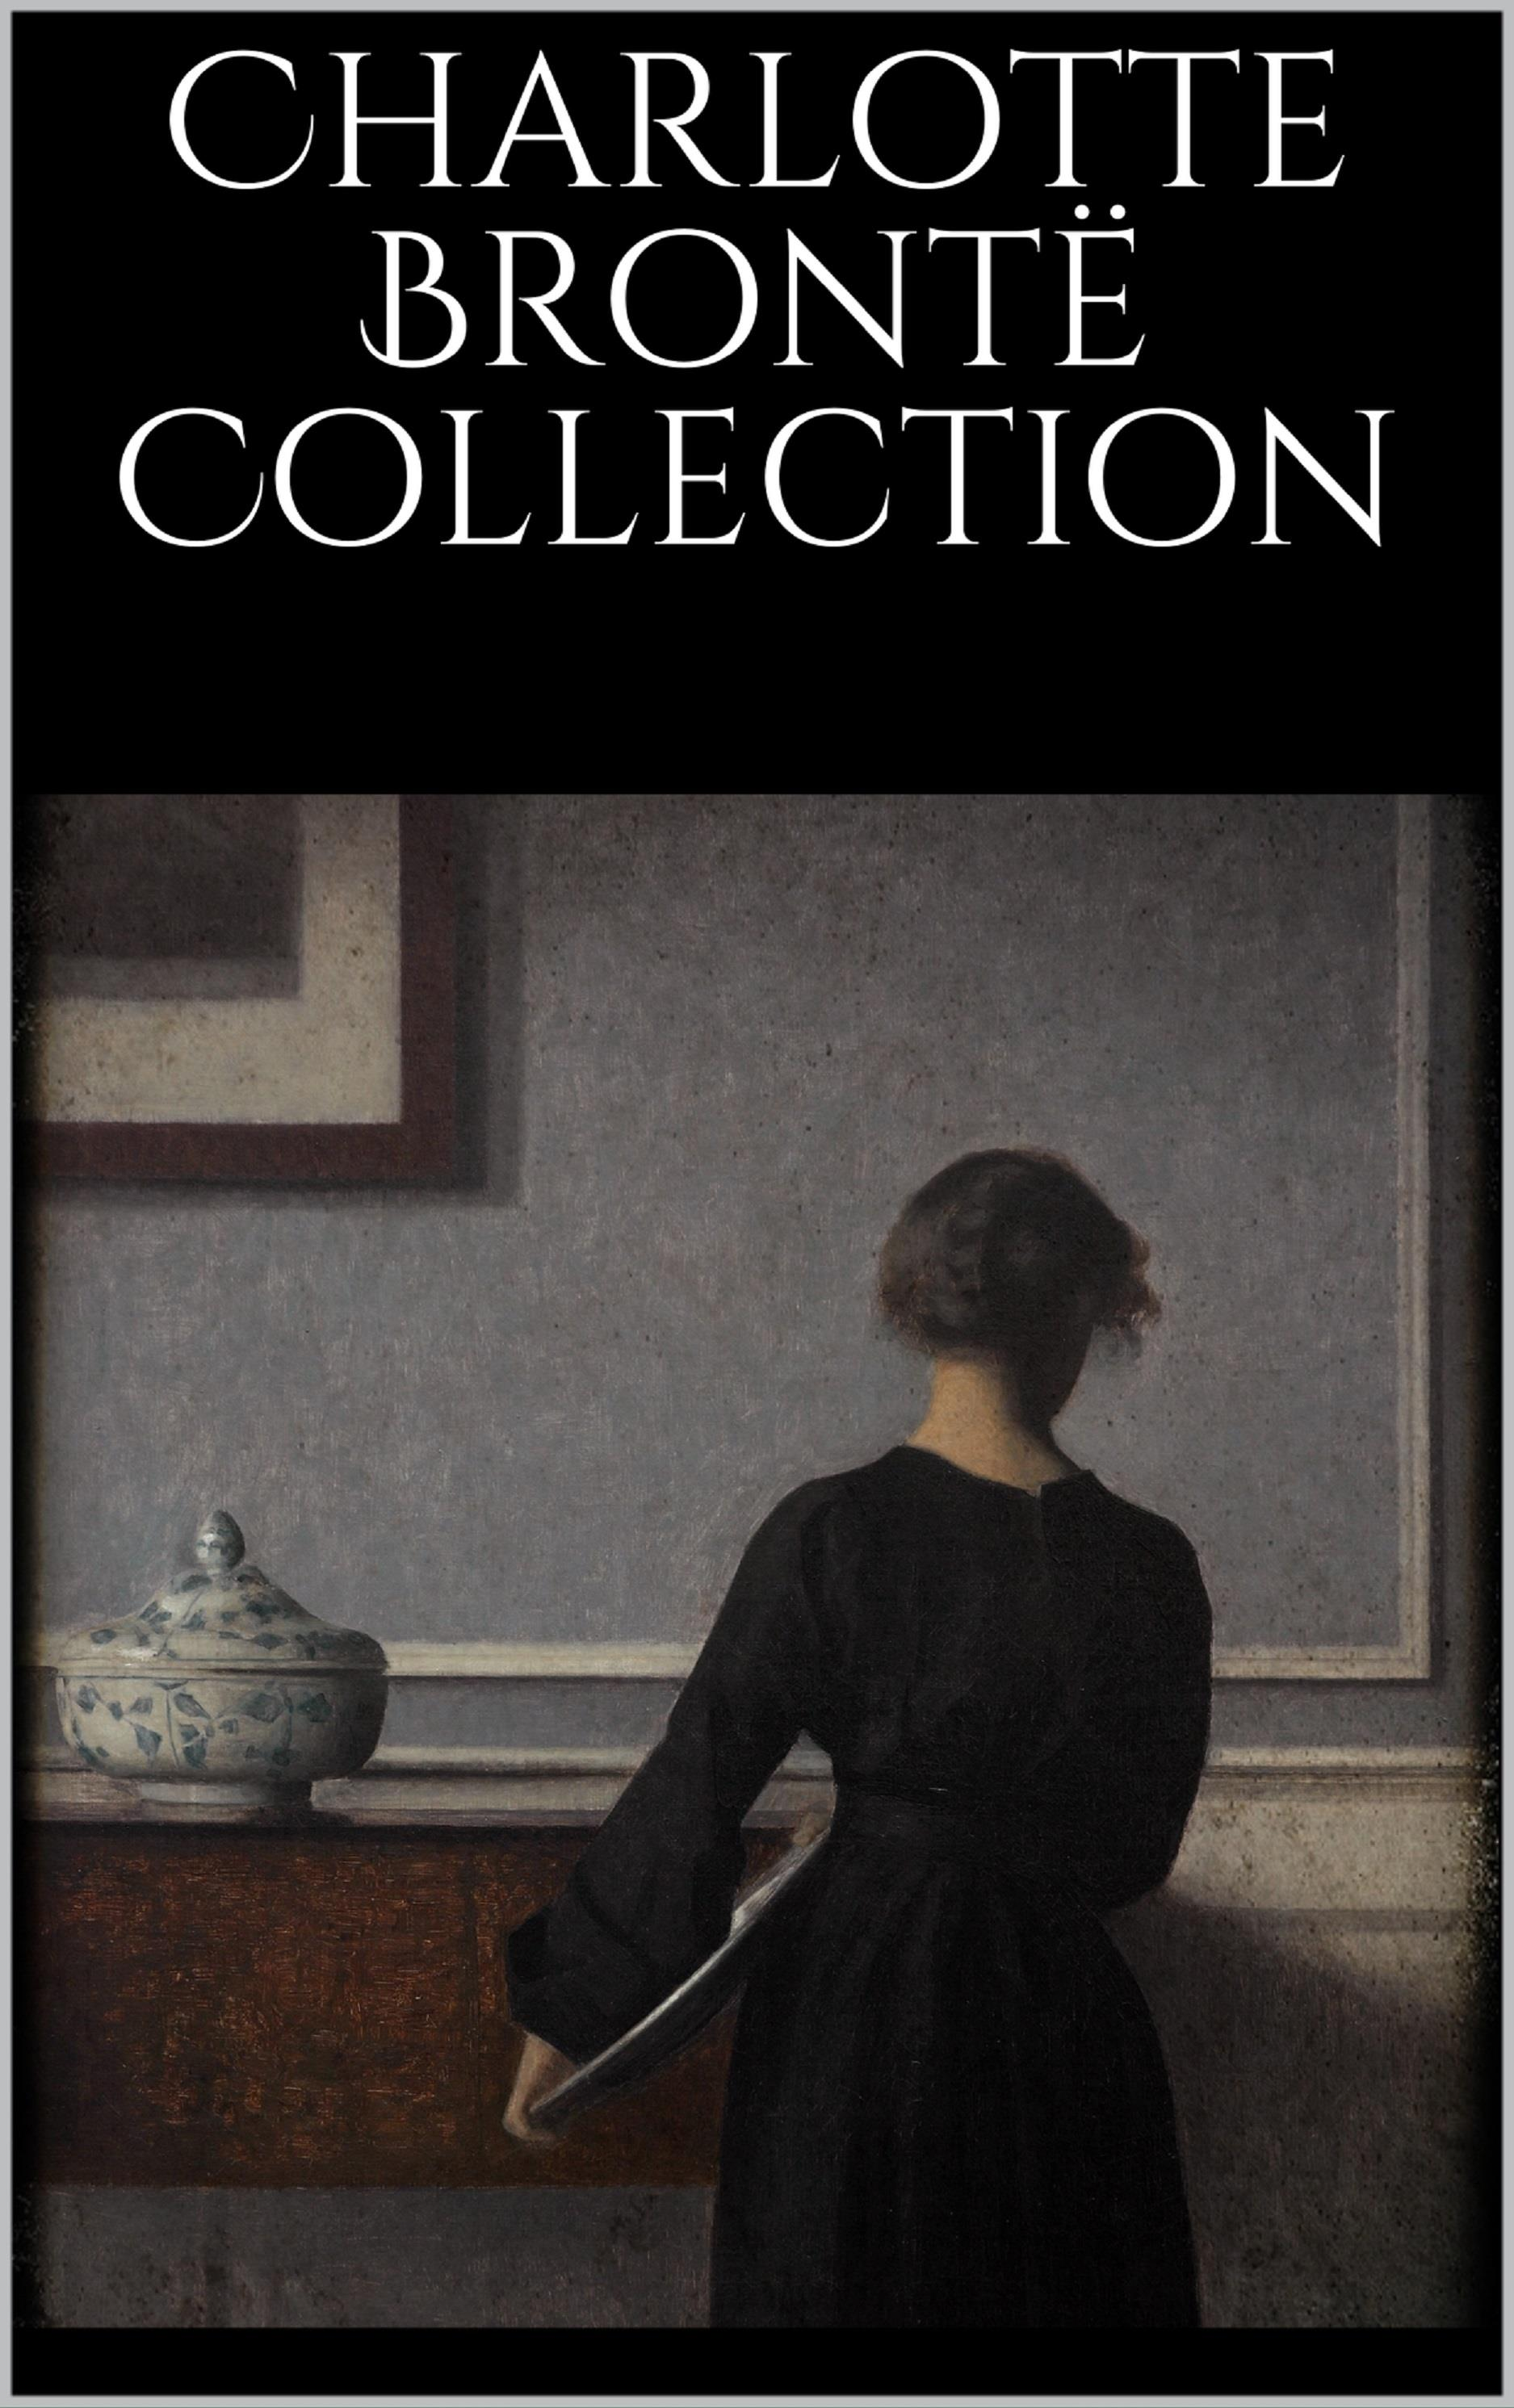 Charlotte Brontë Collection